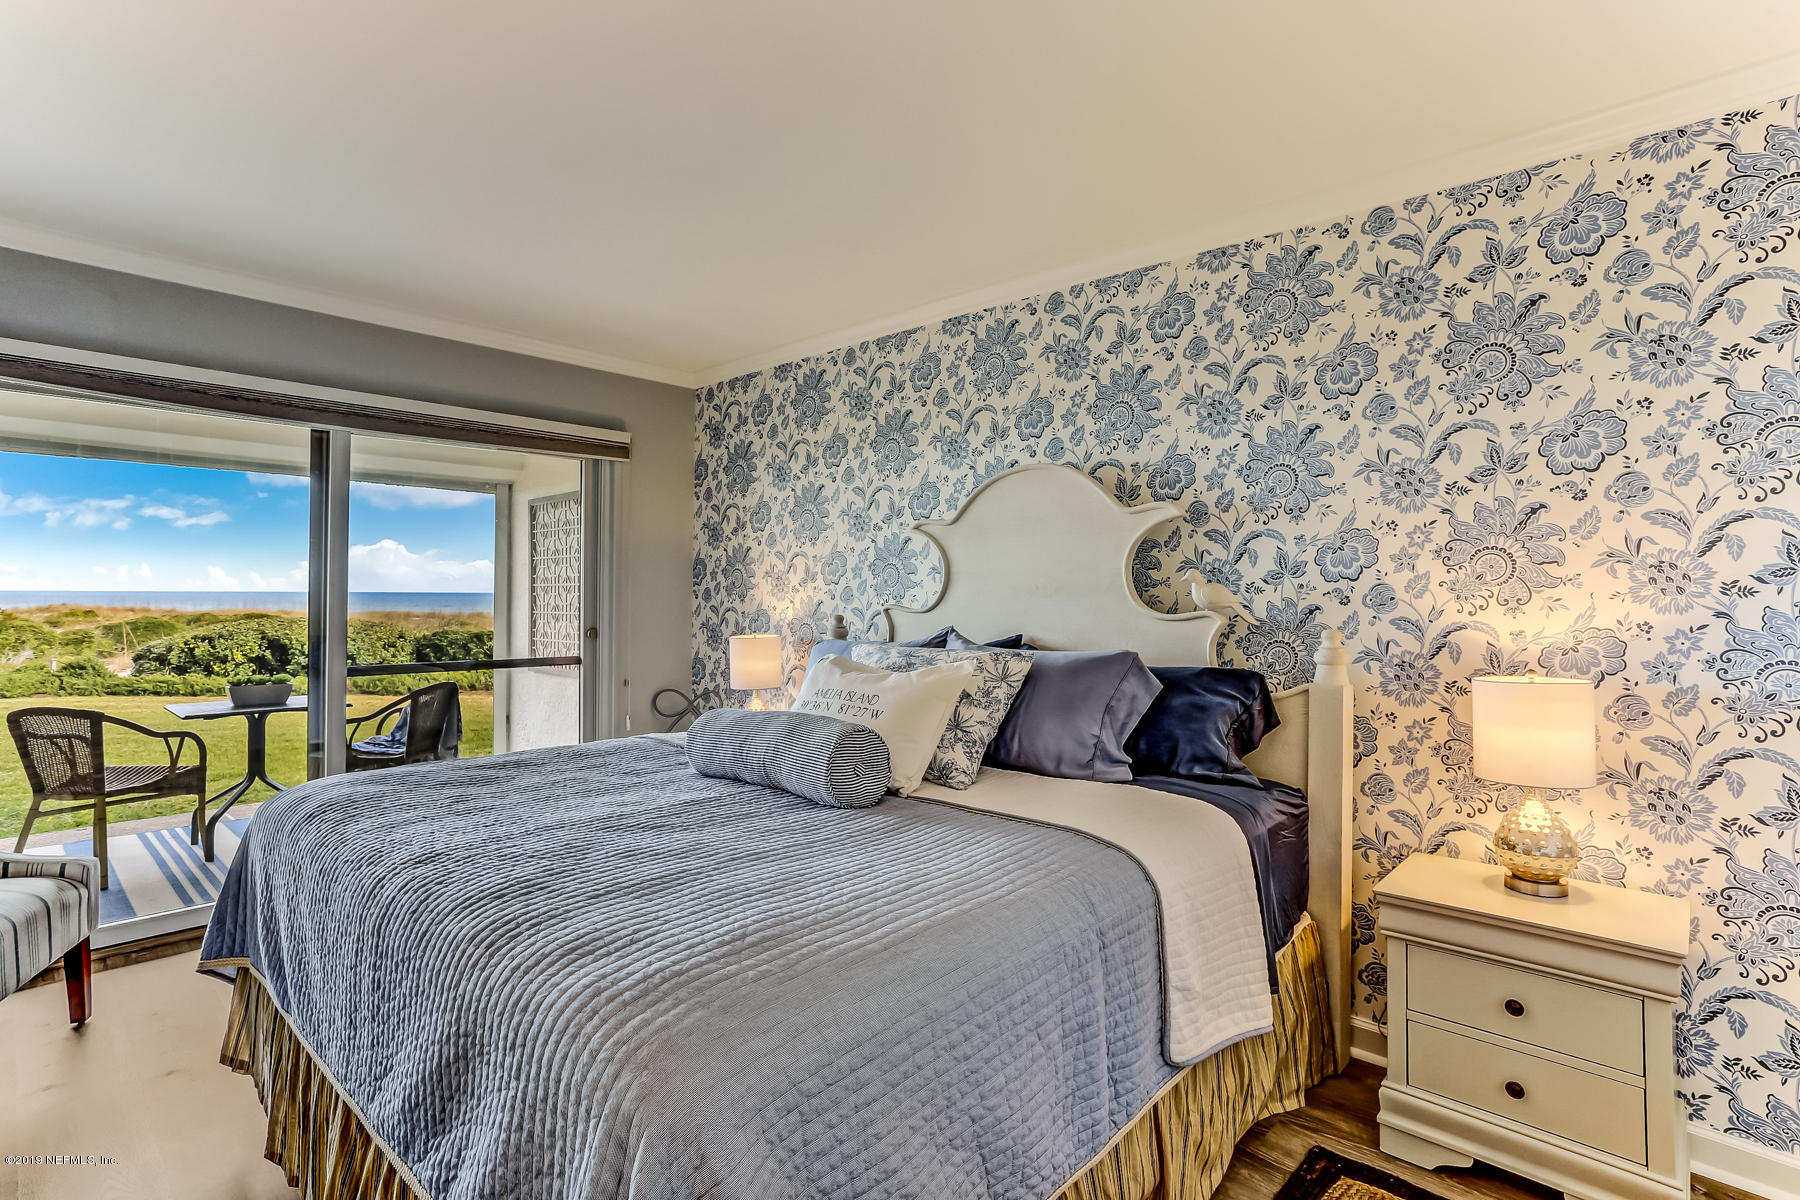 4800 AMELIA ISLAND- AMELIA ISLAND- FLORIDA 32034, 1 Bedroom Bedrooms, ,1 BathroomBathrooms,Condo,For sale,AMELIA ISLAND,1011674